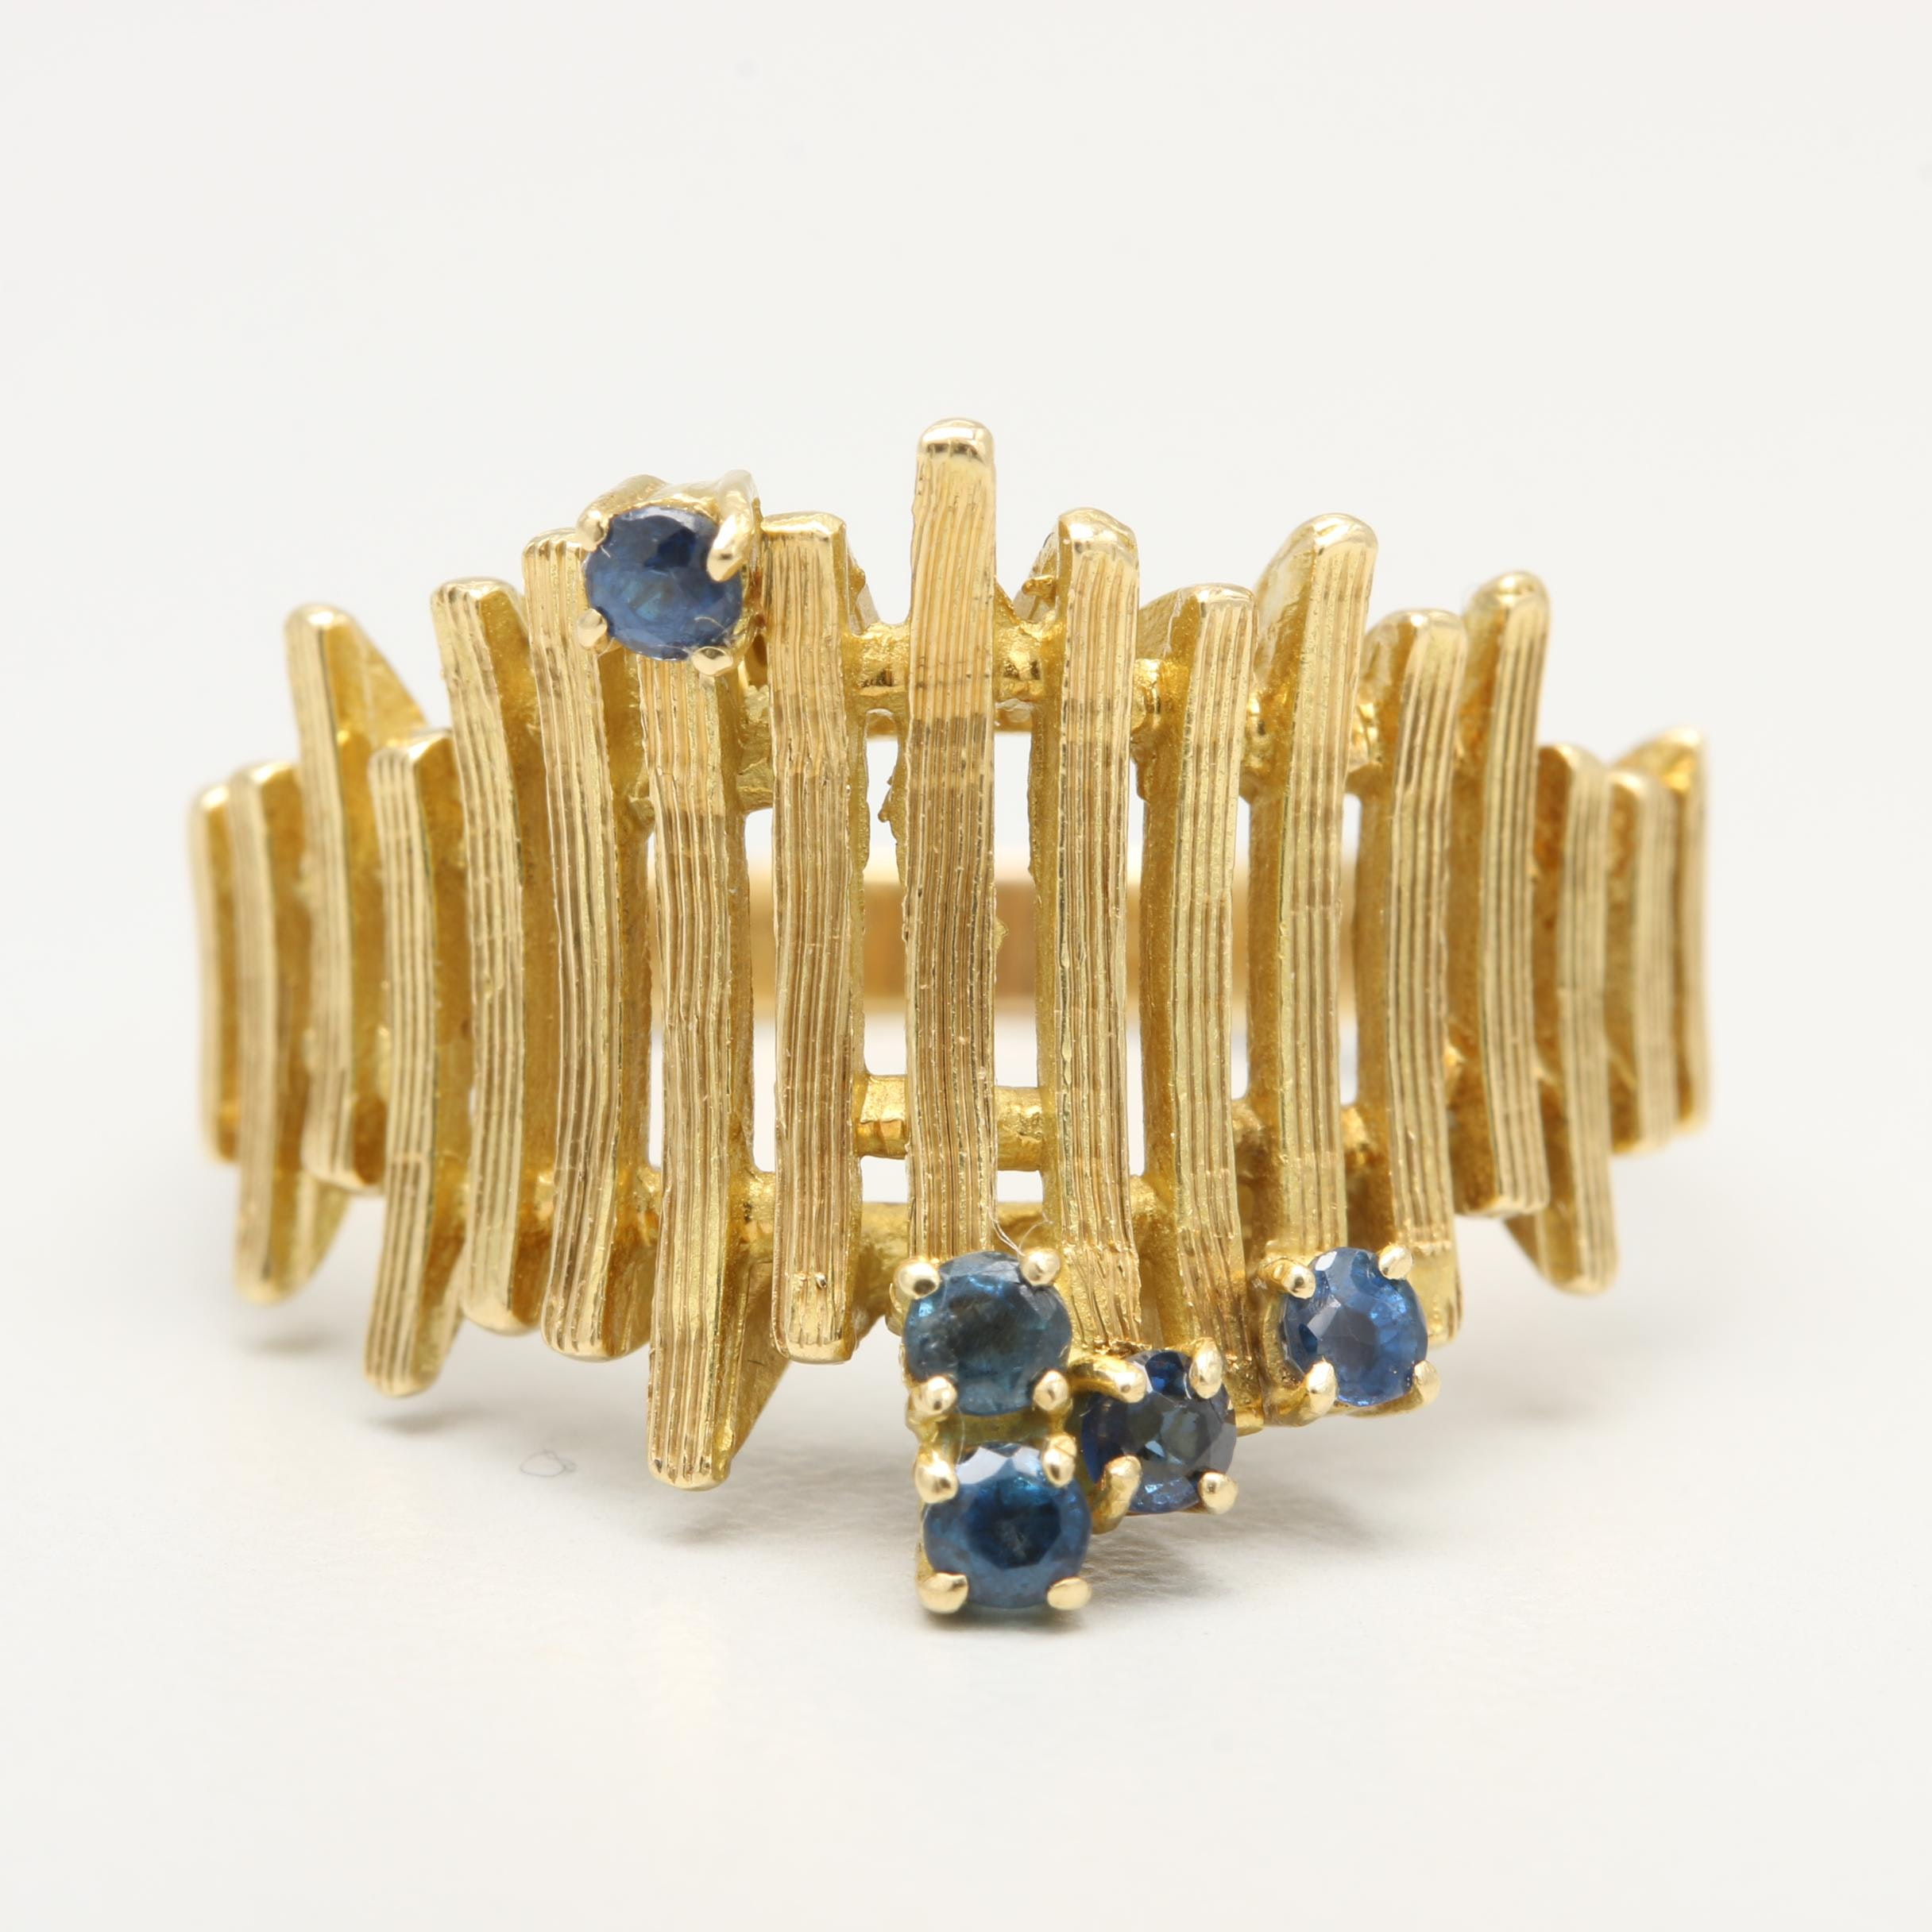 Circa 1960s-1970s 18K Yellow Gold Blue Sapphire Ring